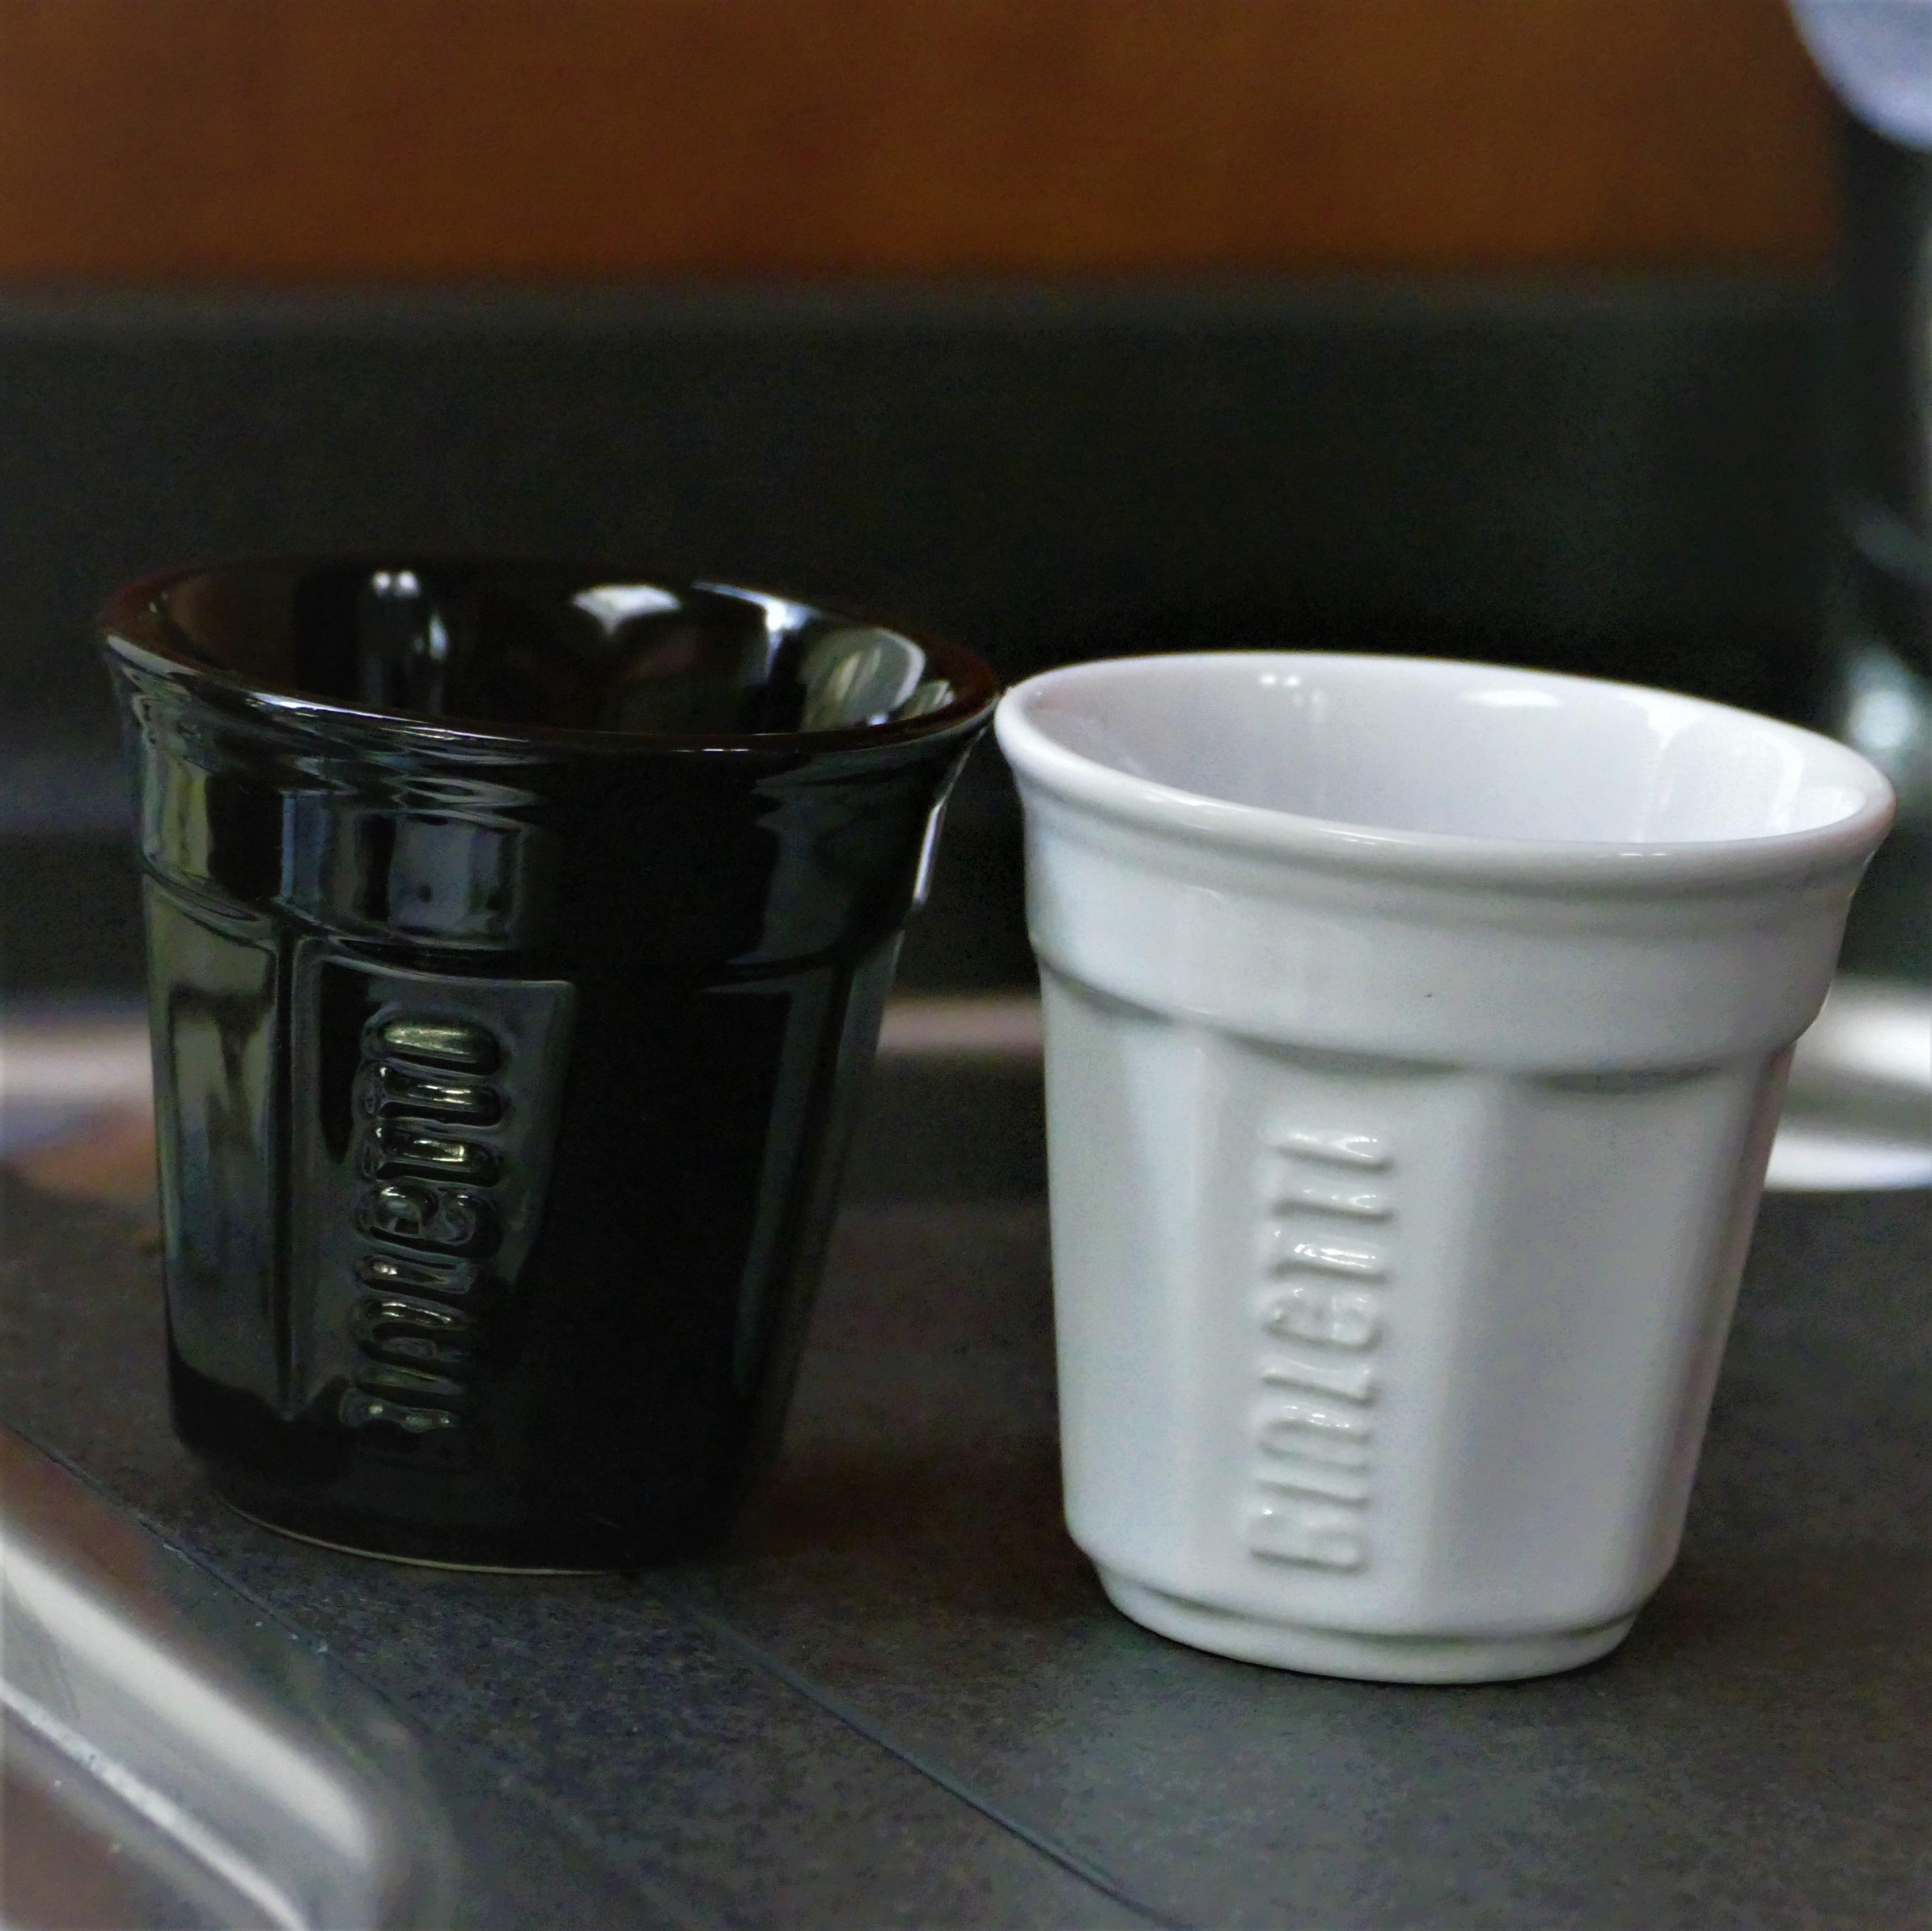 Bialetti I 6 Bicchierini Wit Koppen Zwart Espresso Stuks kPOiXuZT